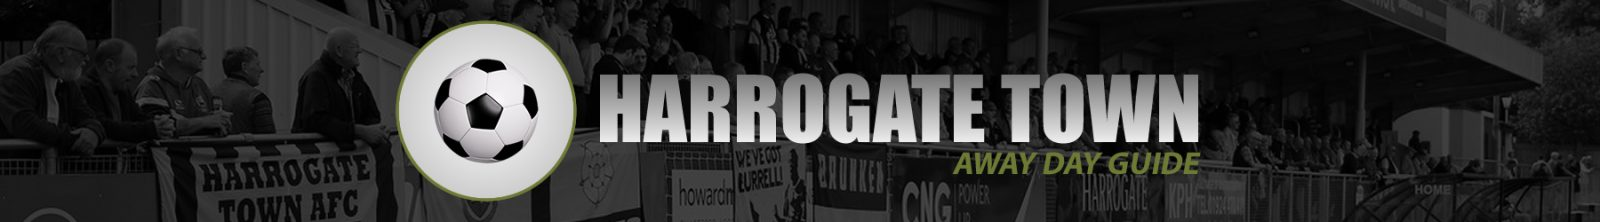 Harrogate Town Away